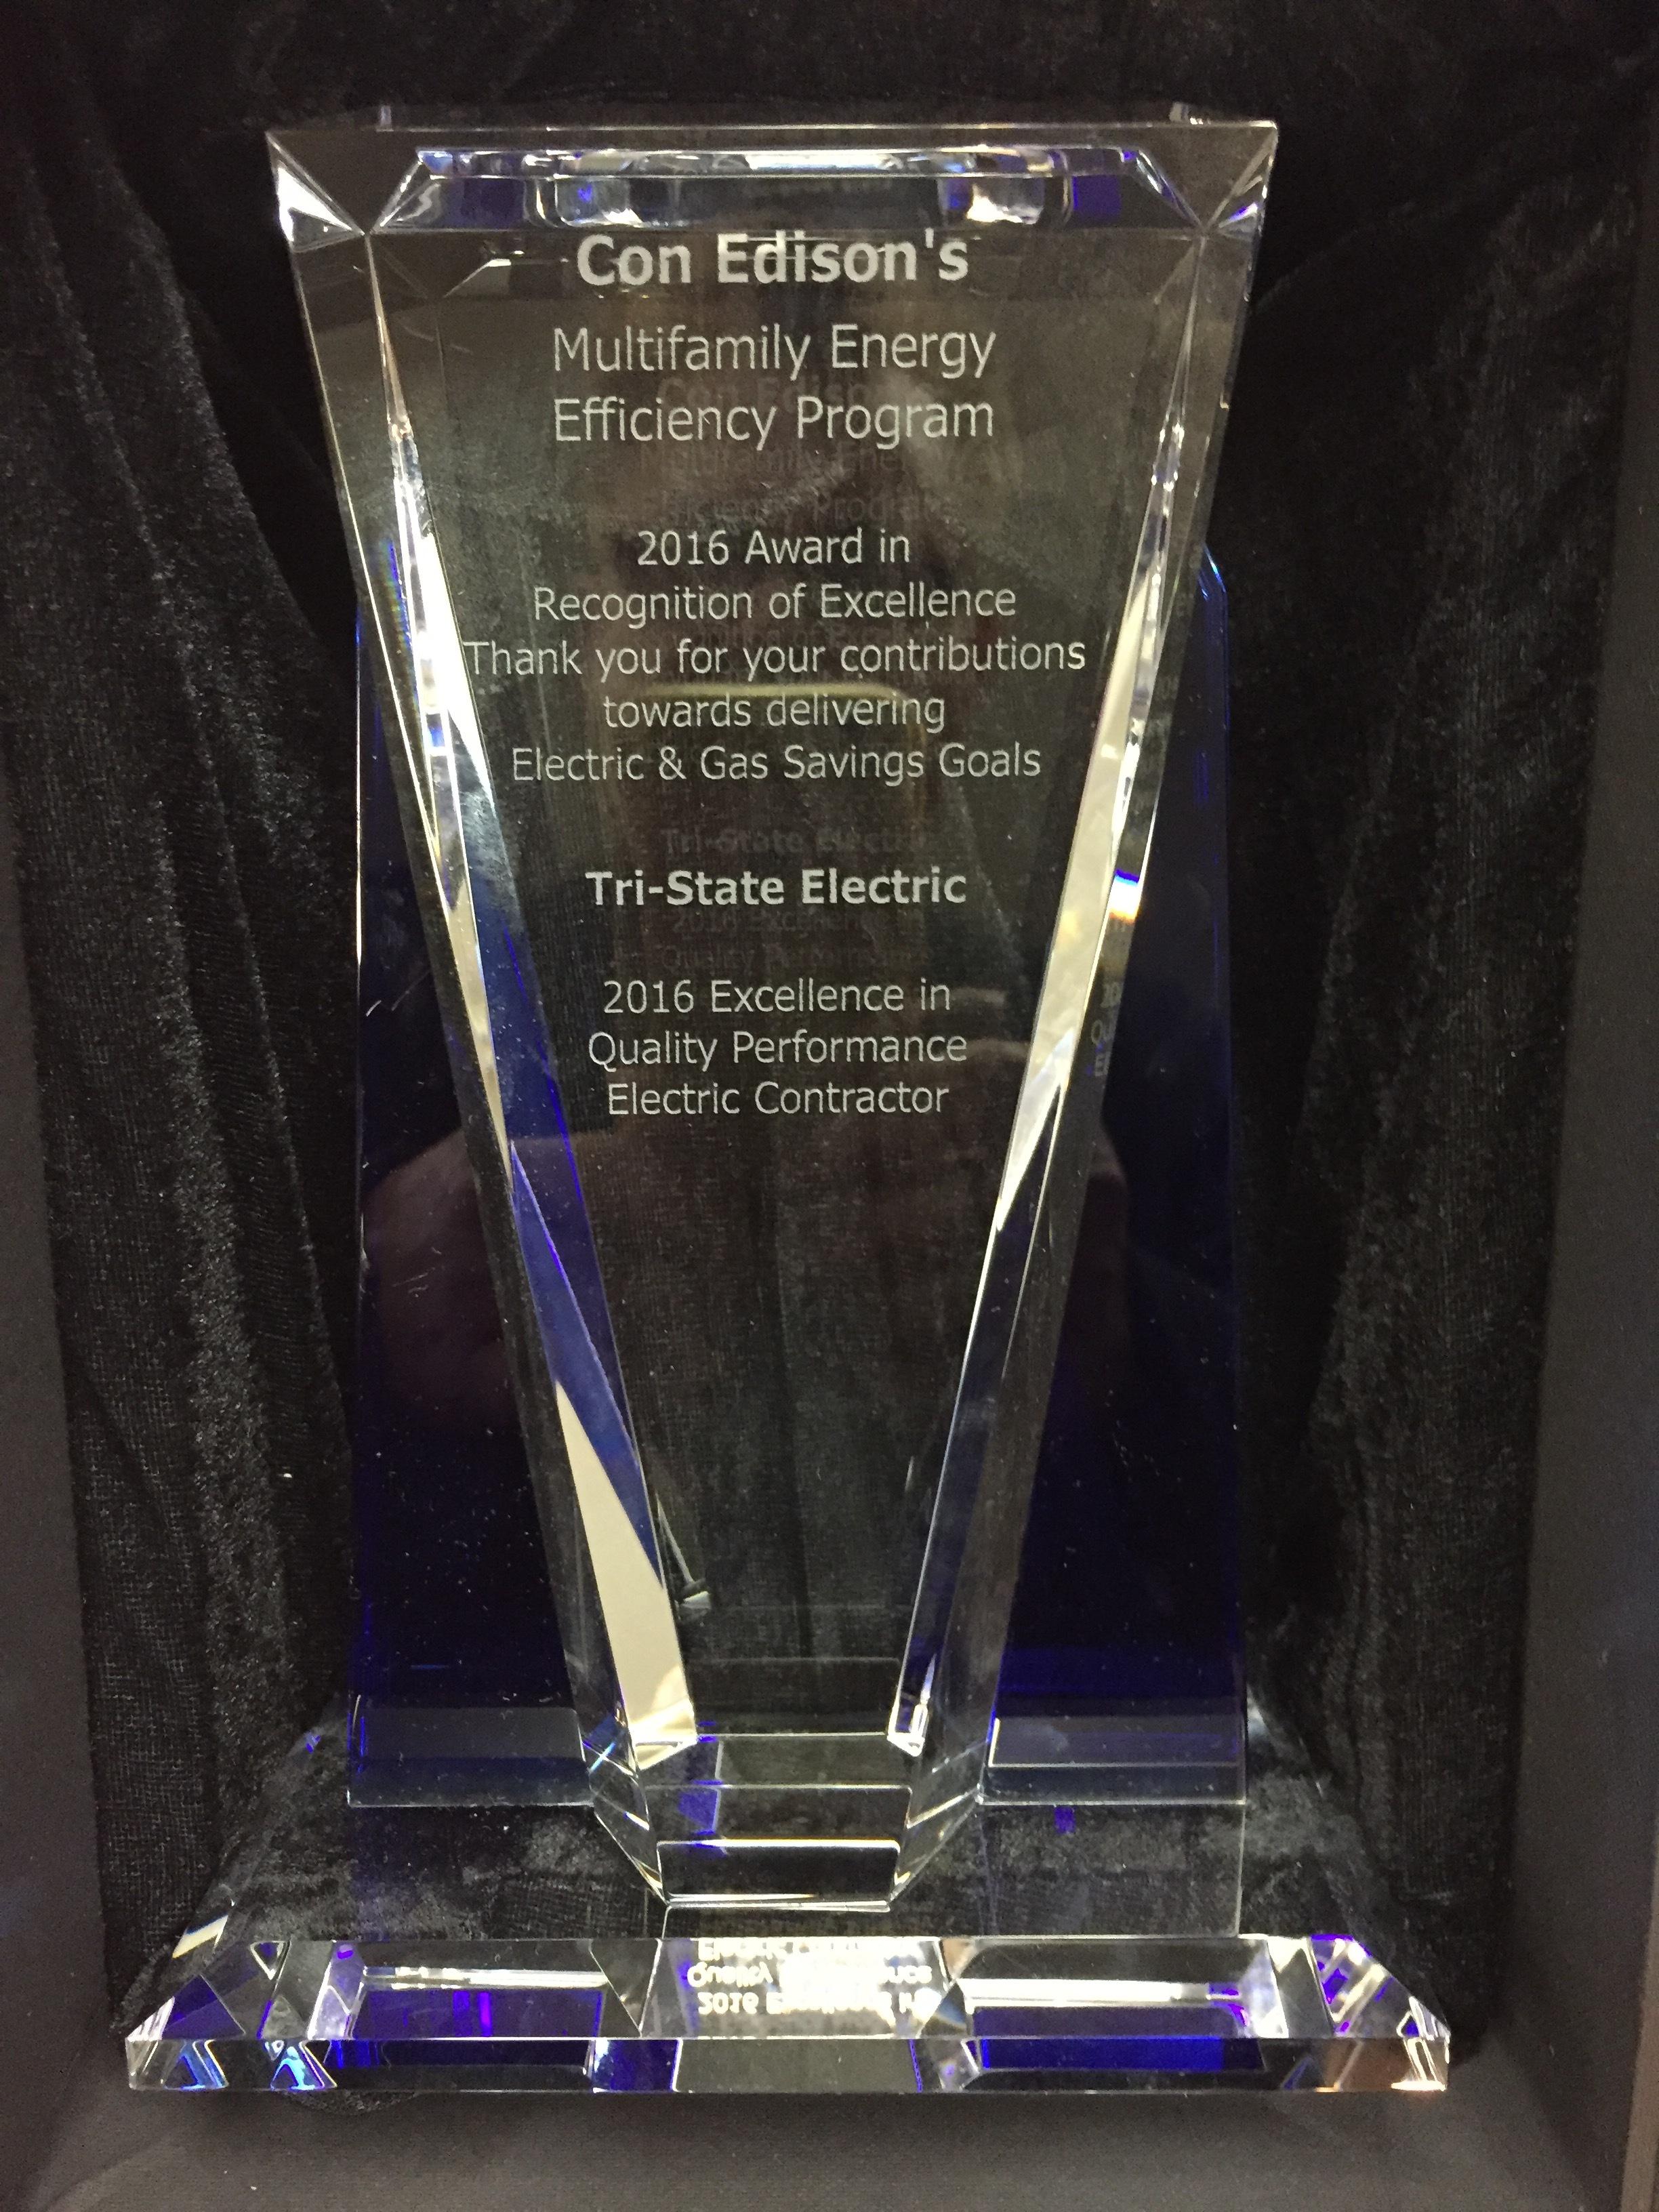 Con Edison MFEEP 2016 Award Winner